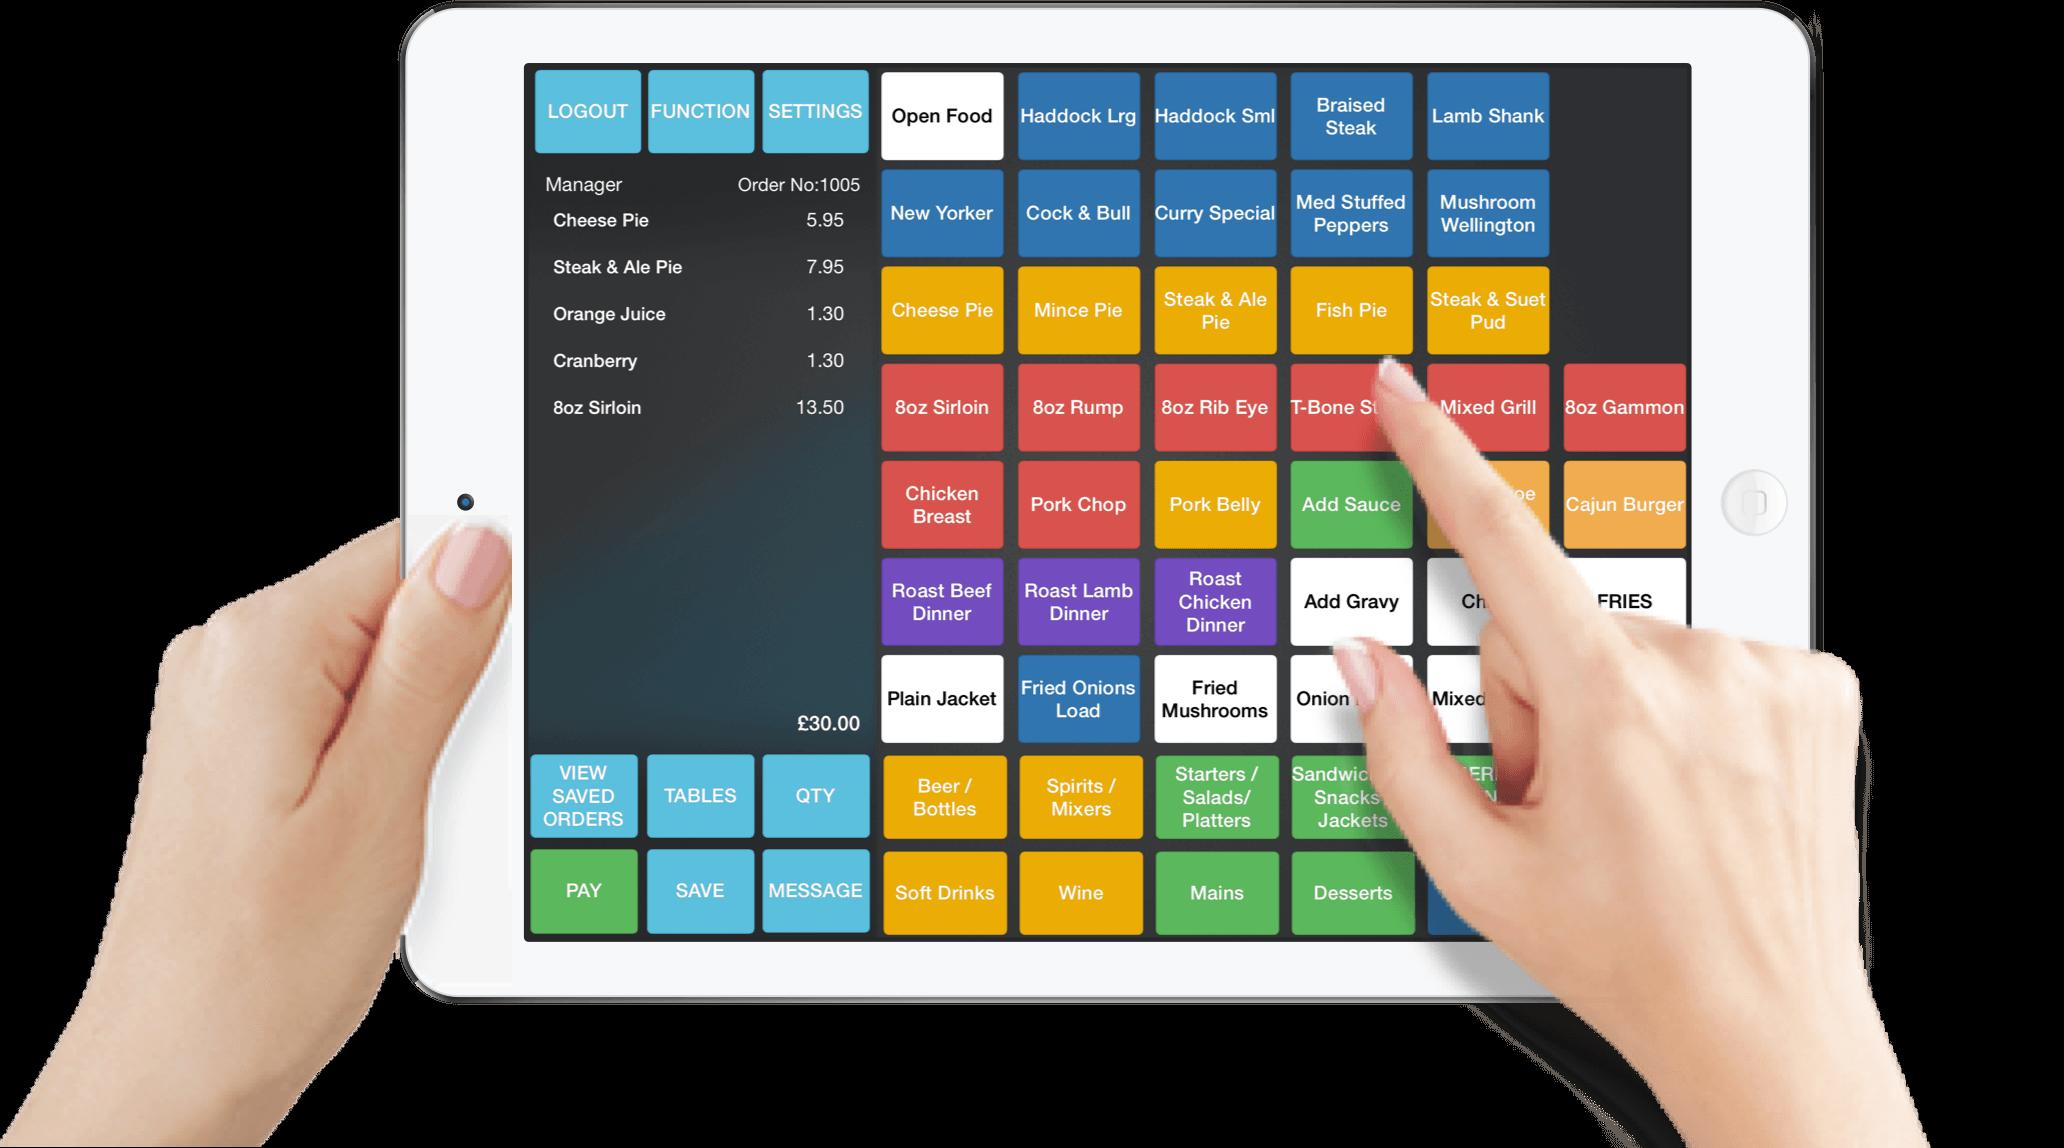 Ipad school clipart png free download Tablet PNG image free download png free download